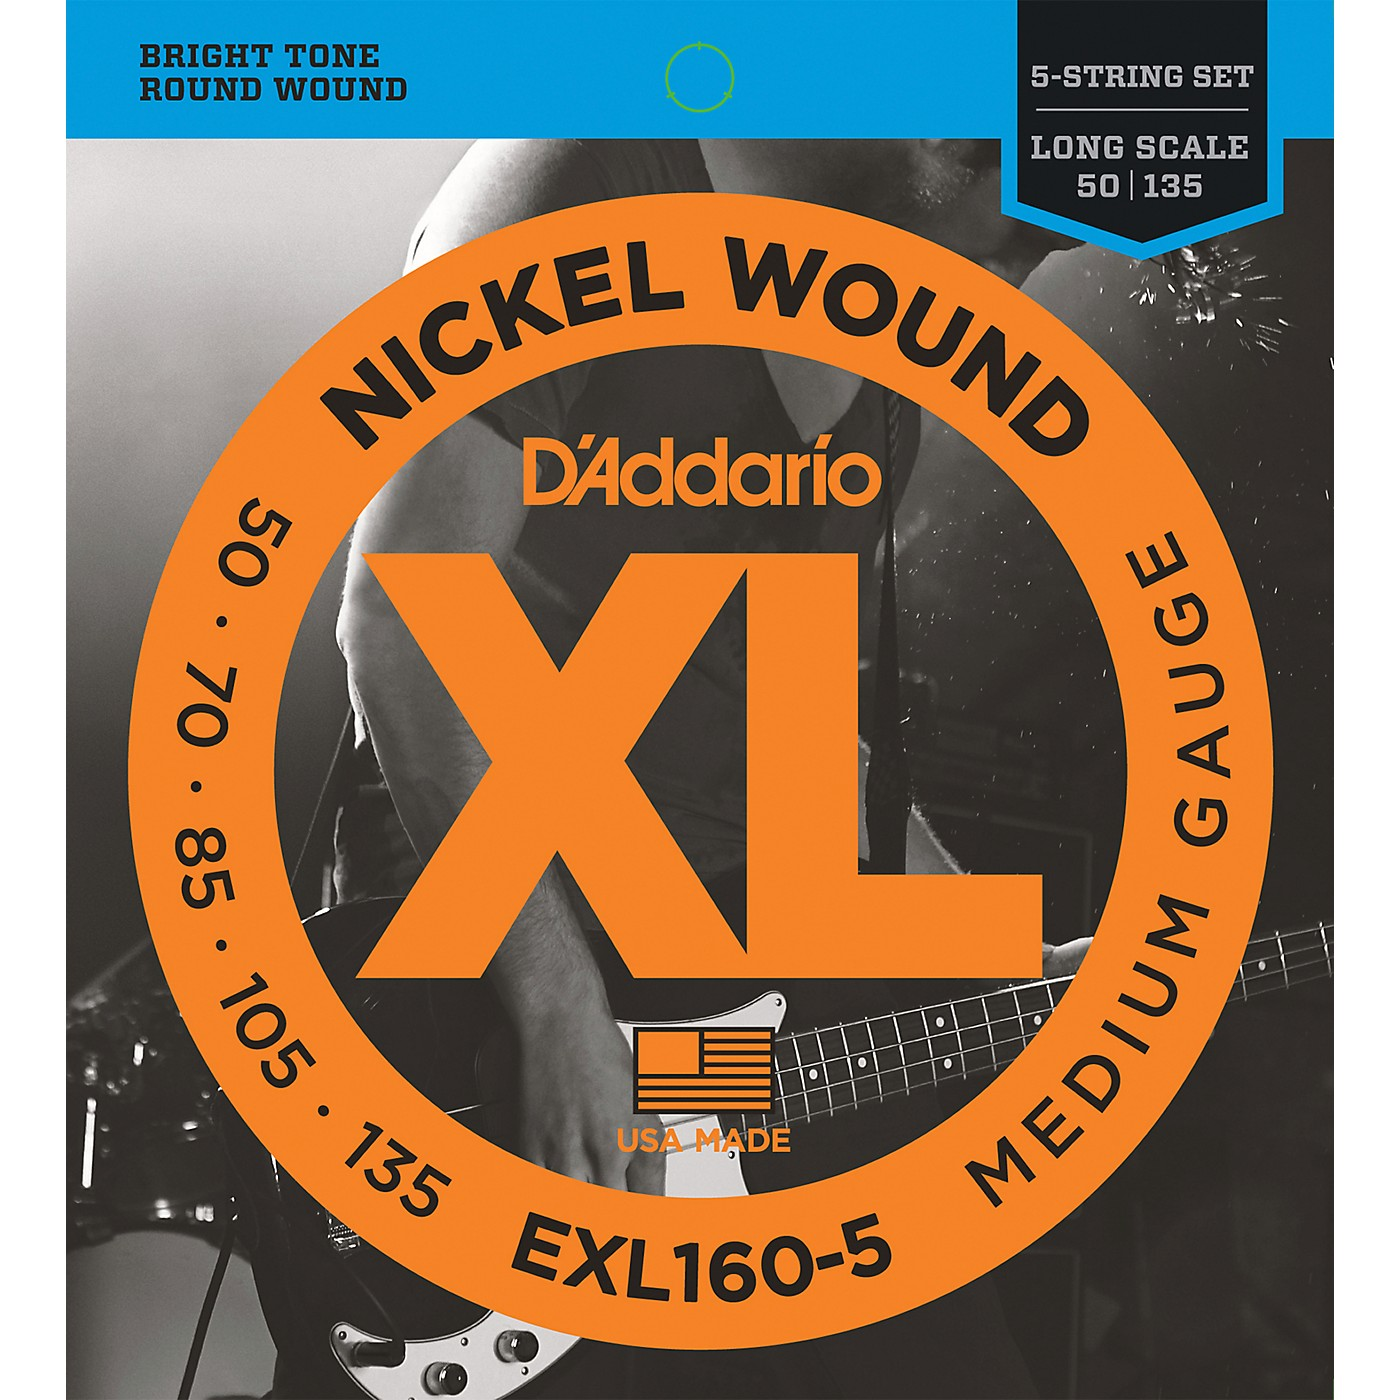 D'Addario EXL160-5 XL 5-String Bass Regular/Long String Set thumbnail